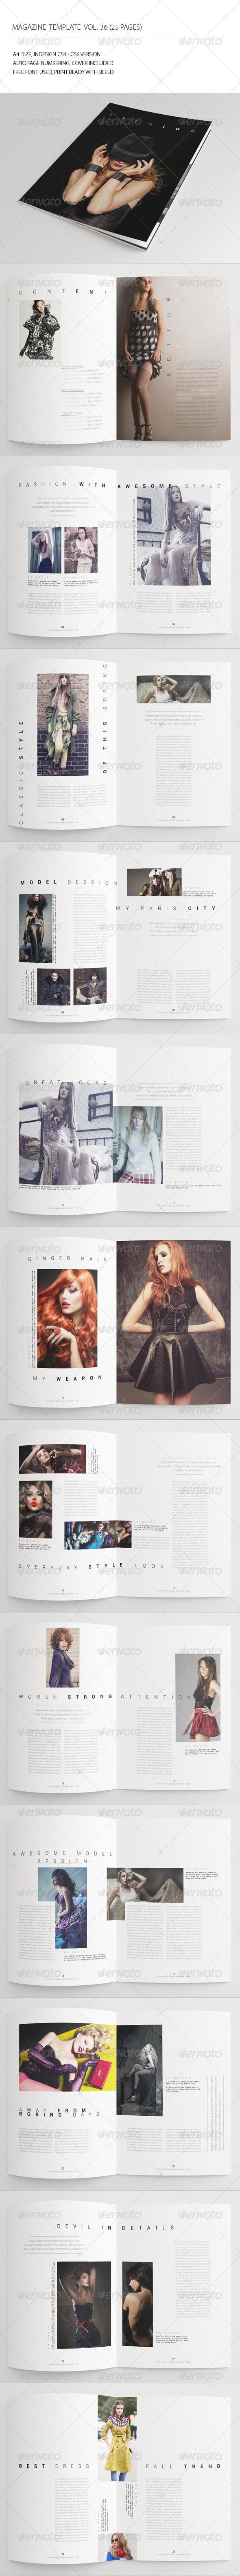 25 Pages Fashion Magazine Vol36 - Magazines Print Templates